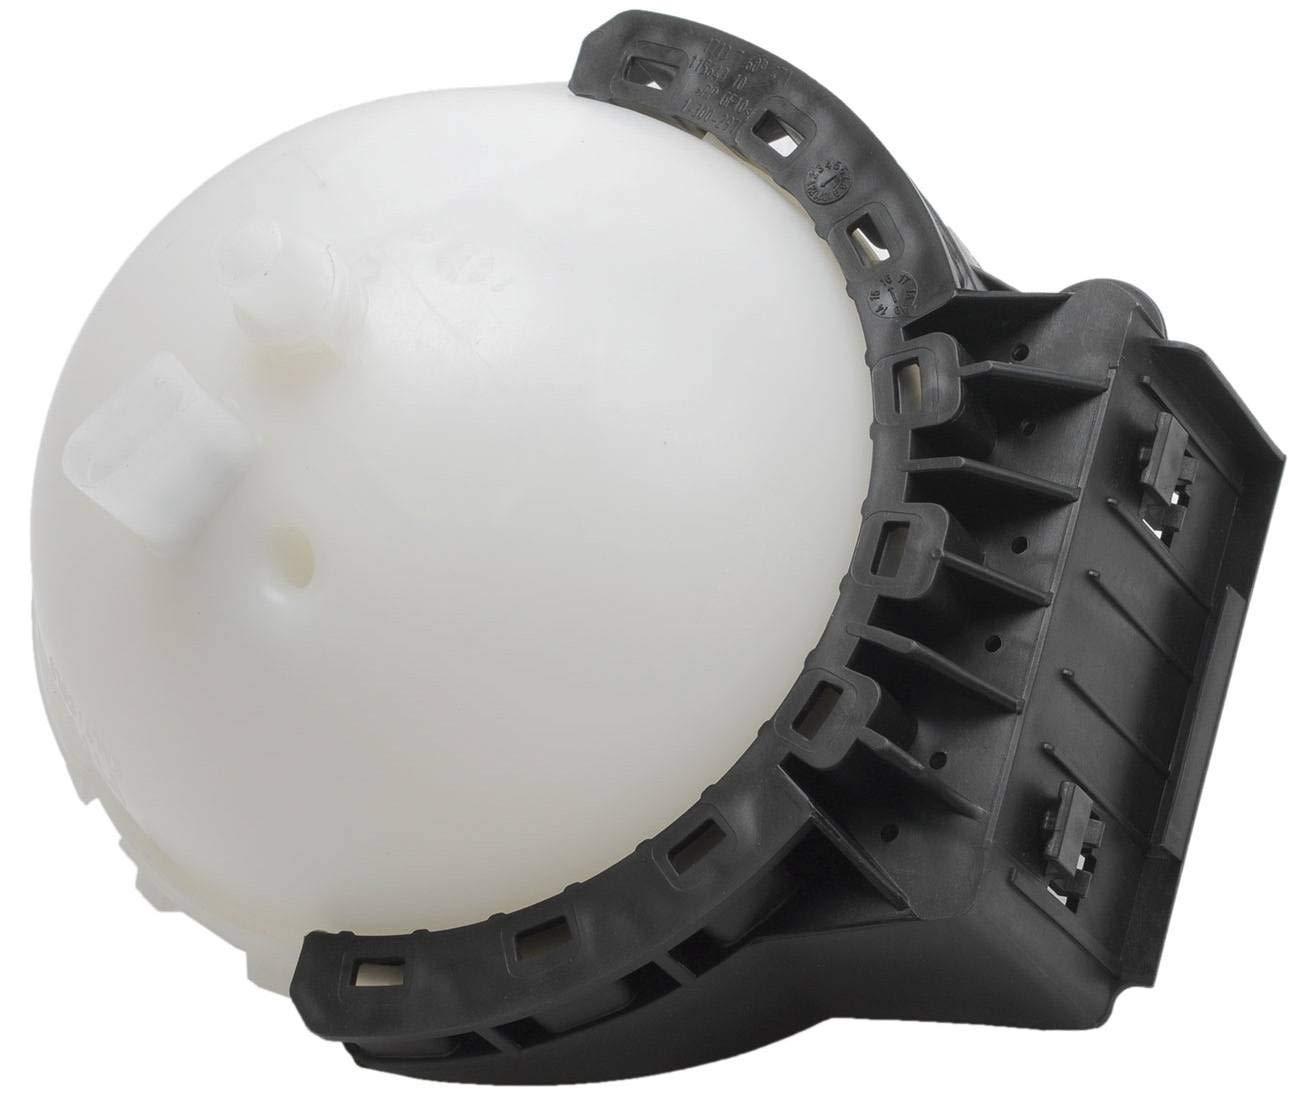 Coolant Reservoir Expansion Tank Sensor For BMW F10 528i 528i xDrive 2.0L New